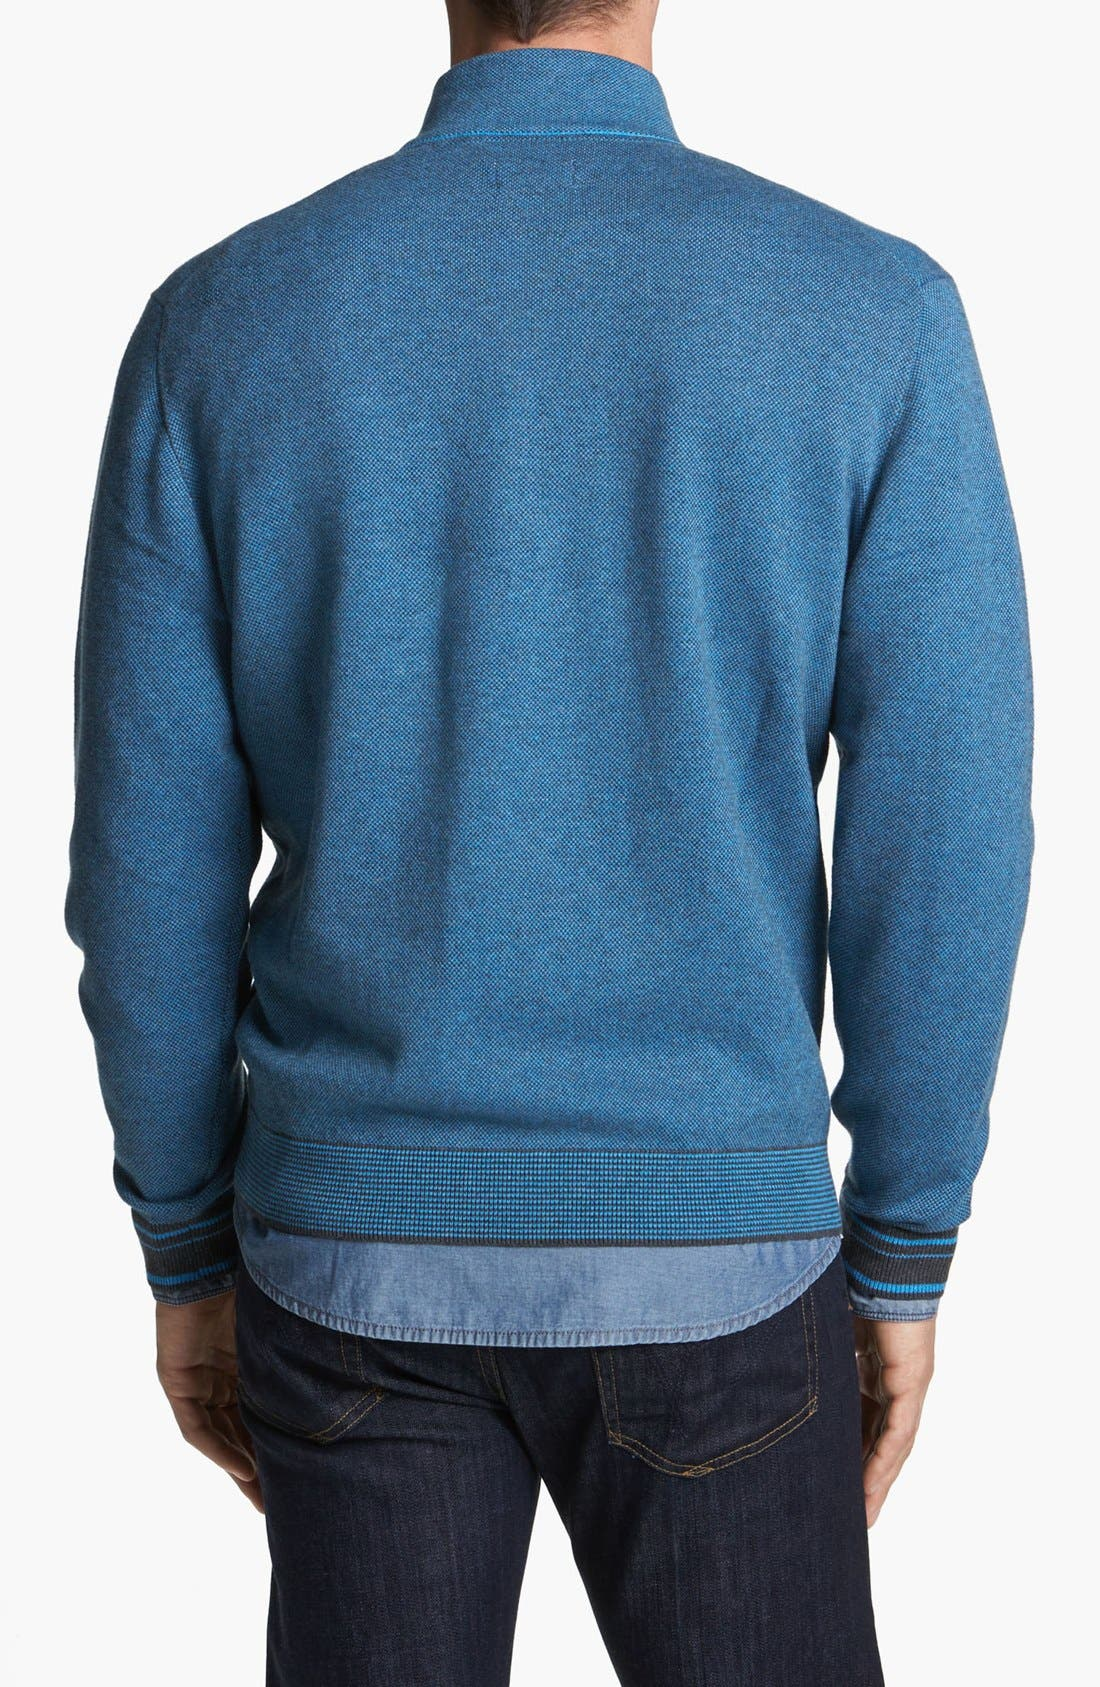 Alternate Image 2  - Cutter & Buck 'Haven' Half Zip Bird's Eye Sweater (Big & Tall)